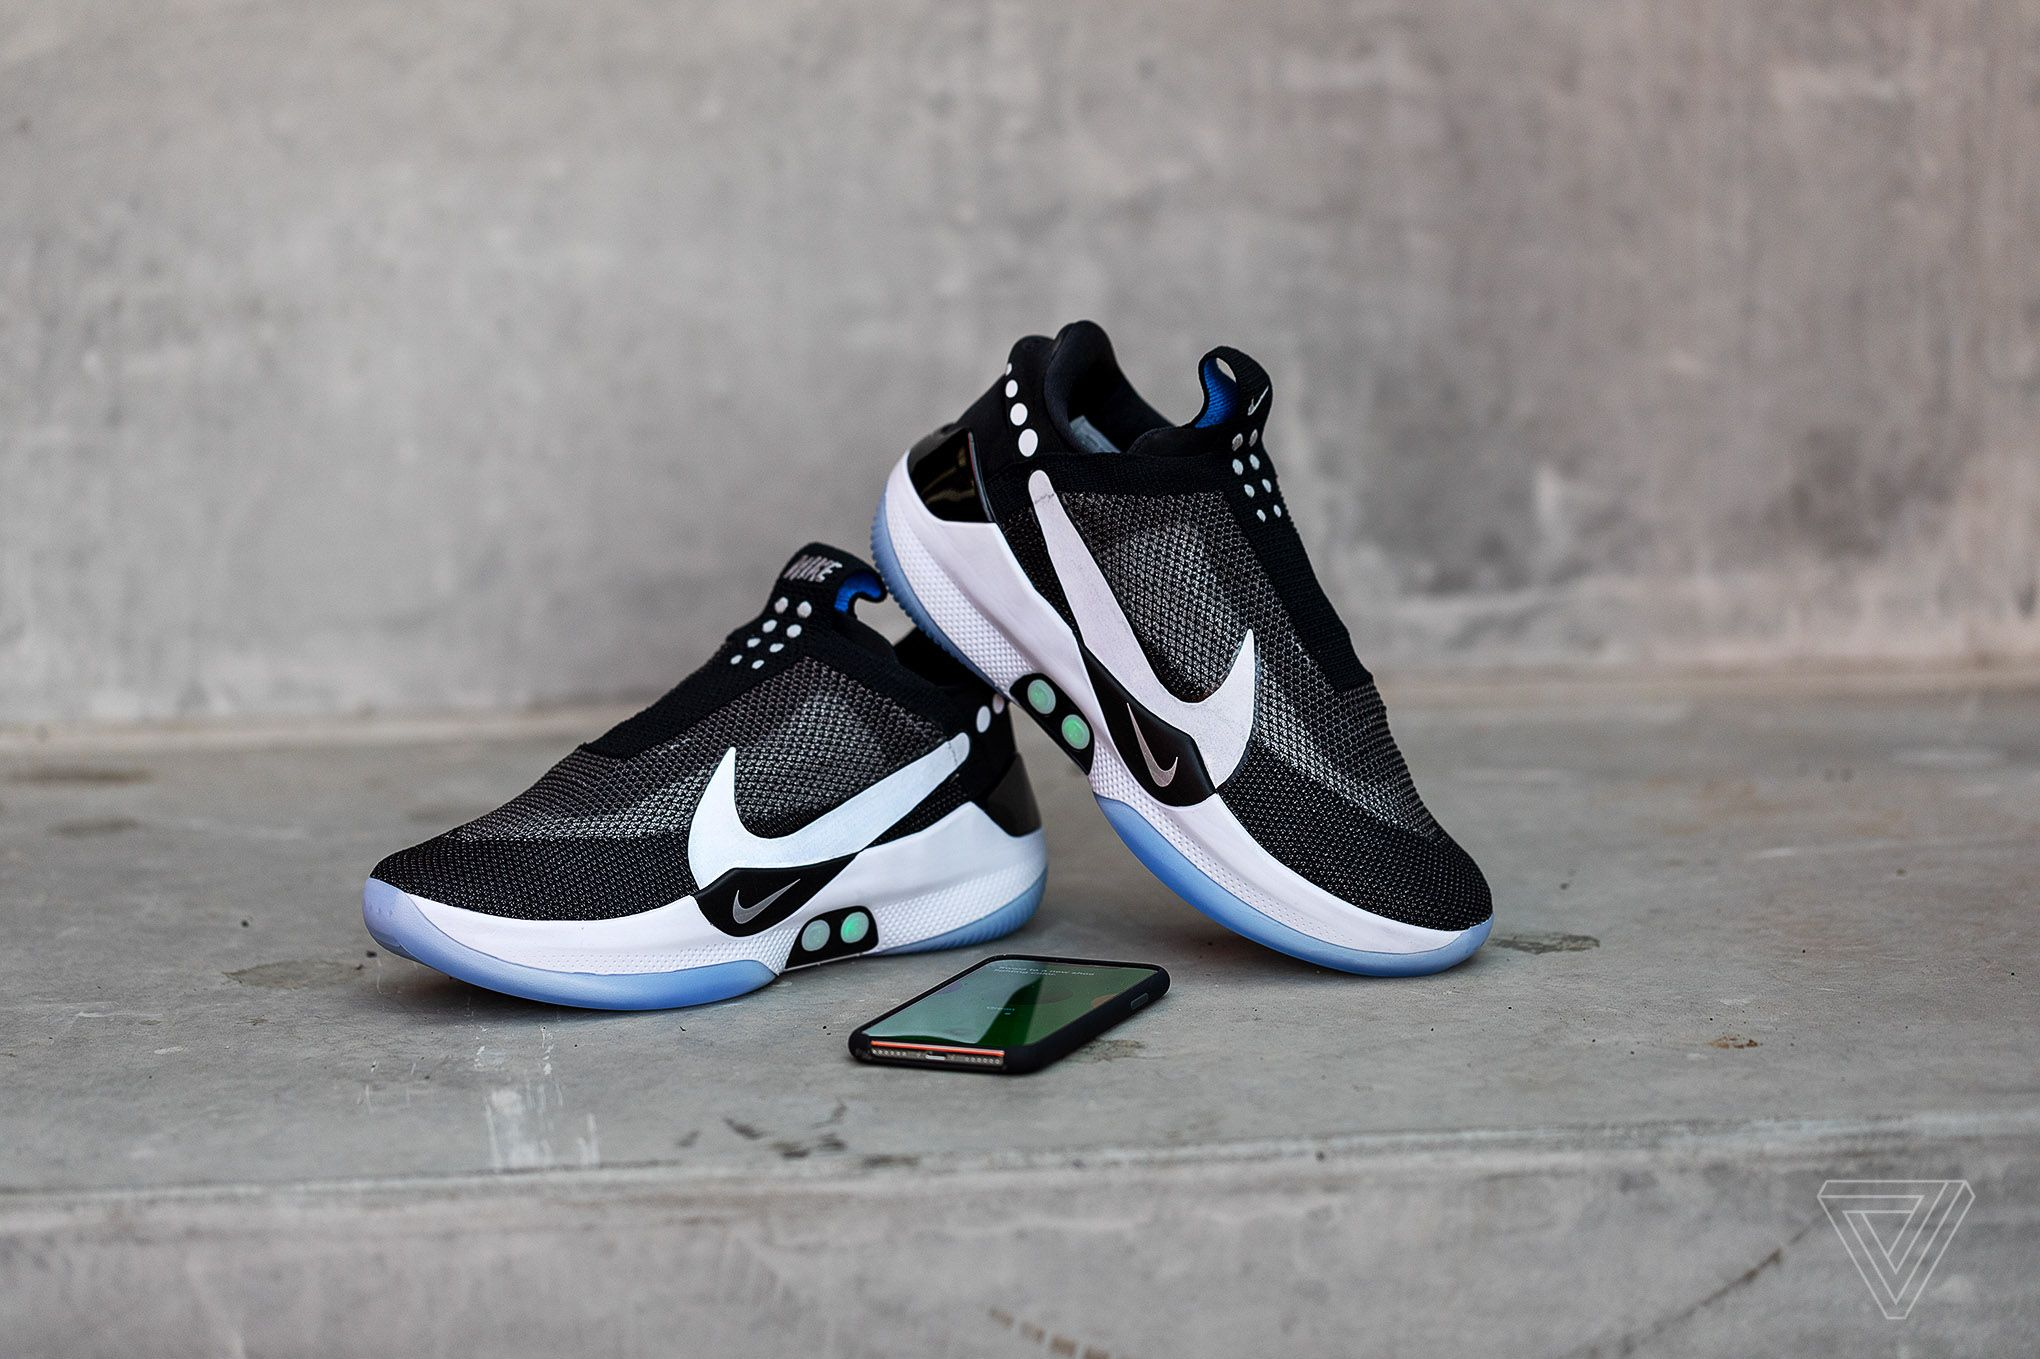 De Couleur Nike Change Chaussure zUqVSMp